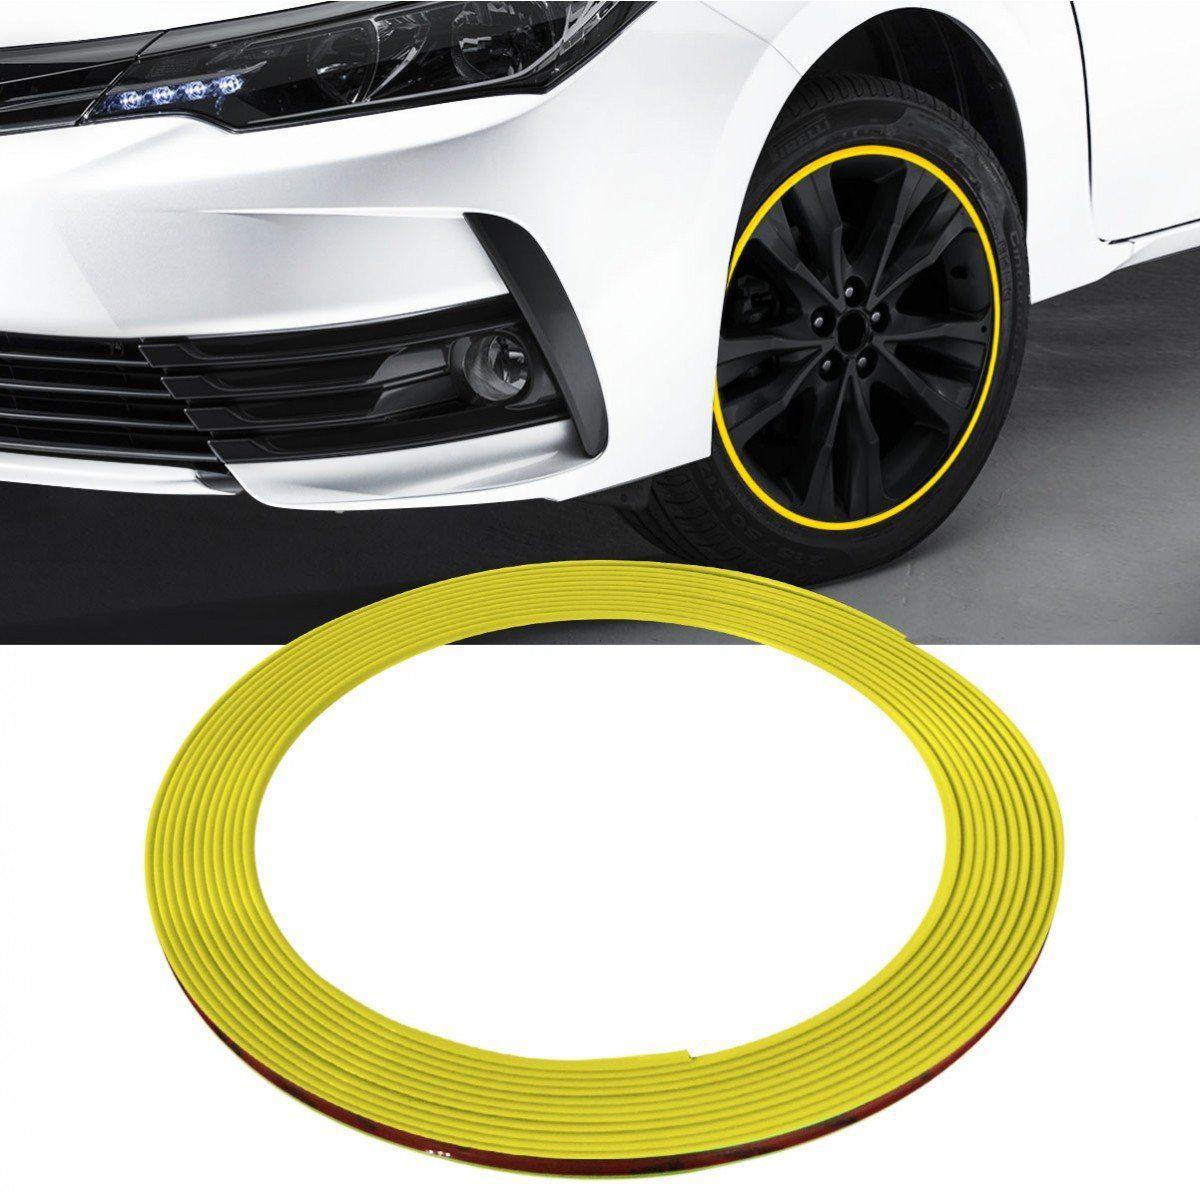 Friso Protetor Roda Liga Leve Esportiva Tuning 8m - Amarelo